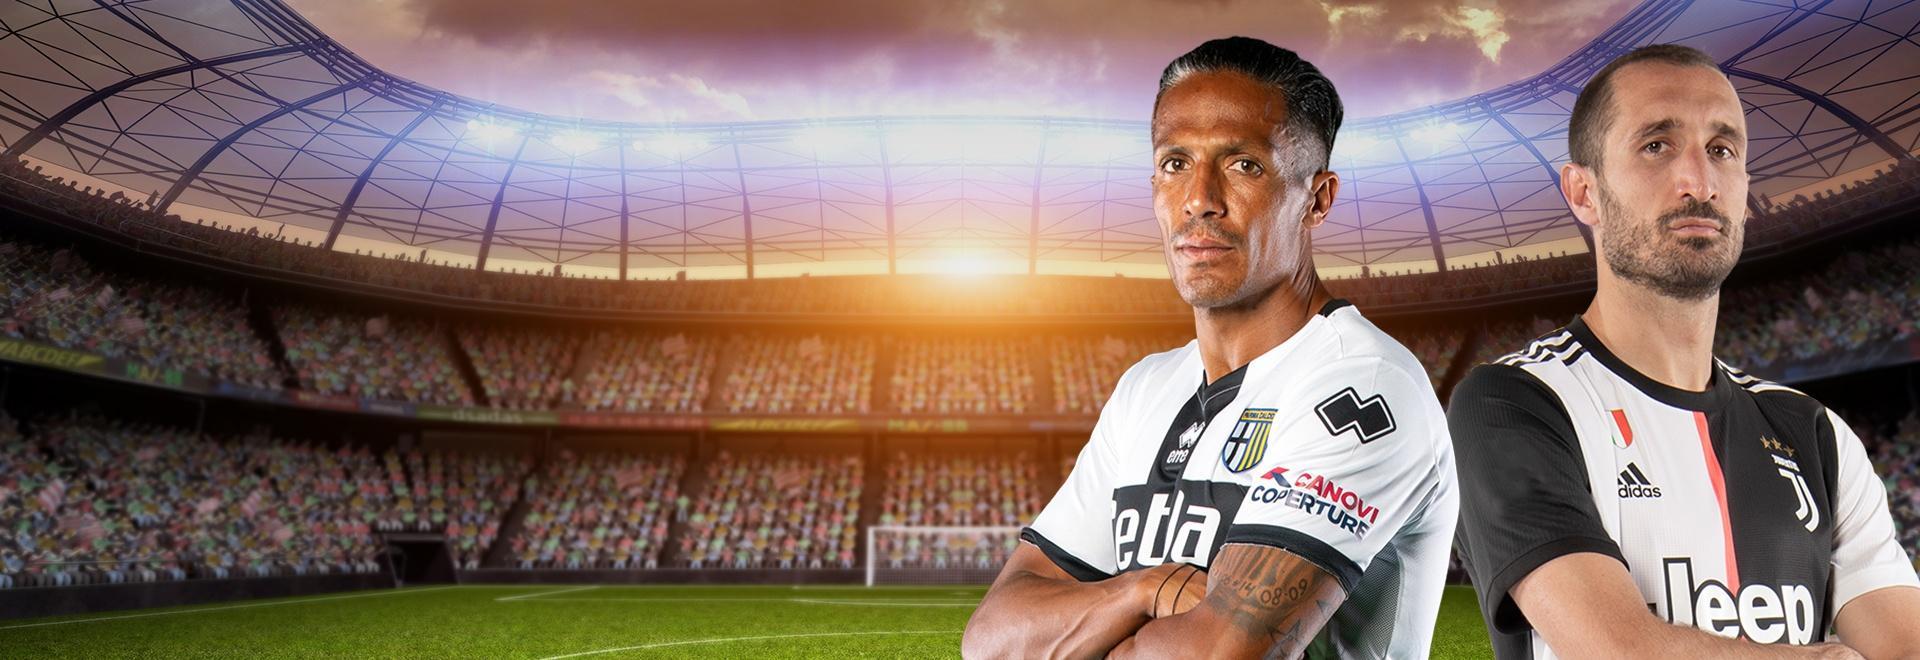 Parma - Juventus. 1a g.